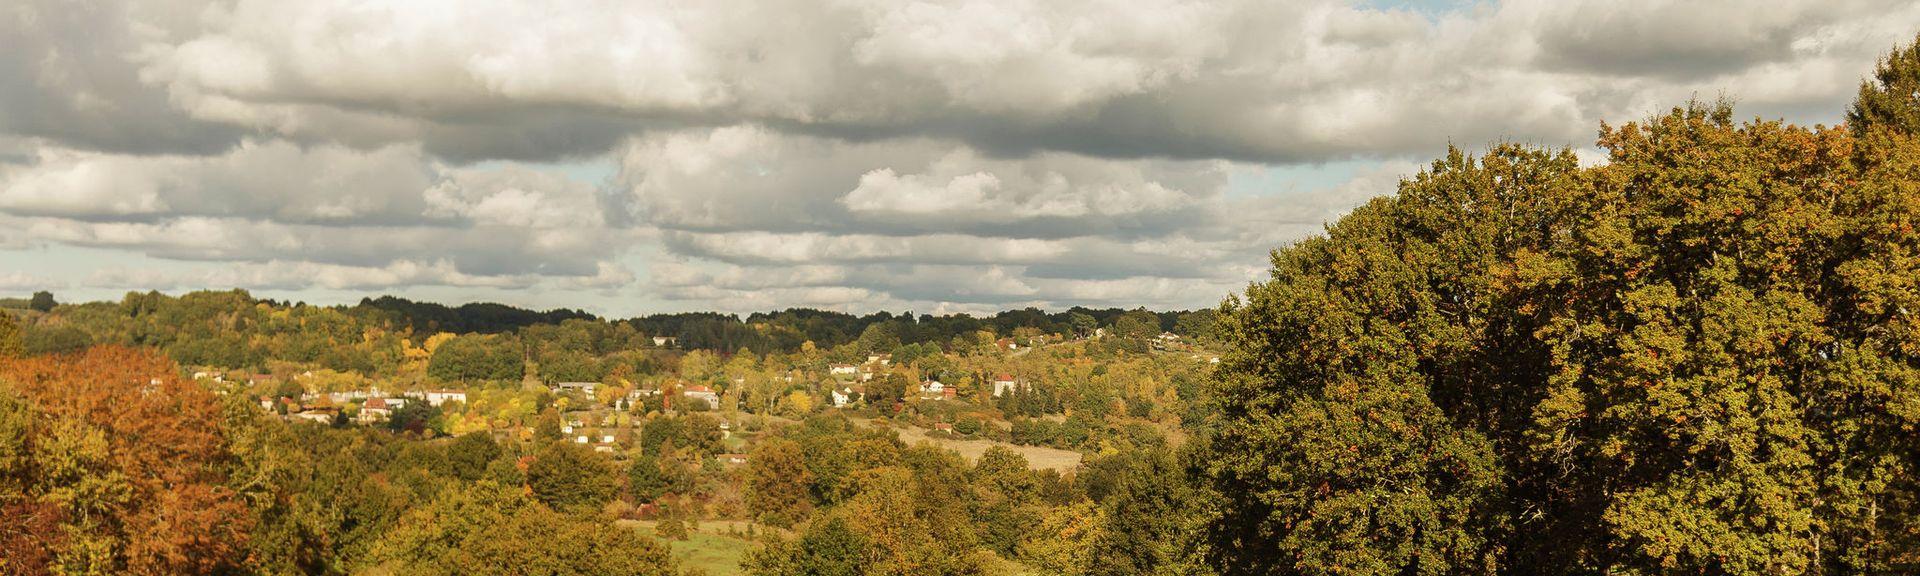 Campagnac-lès-Quercy, France